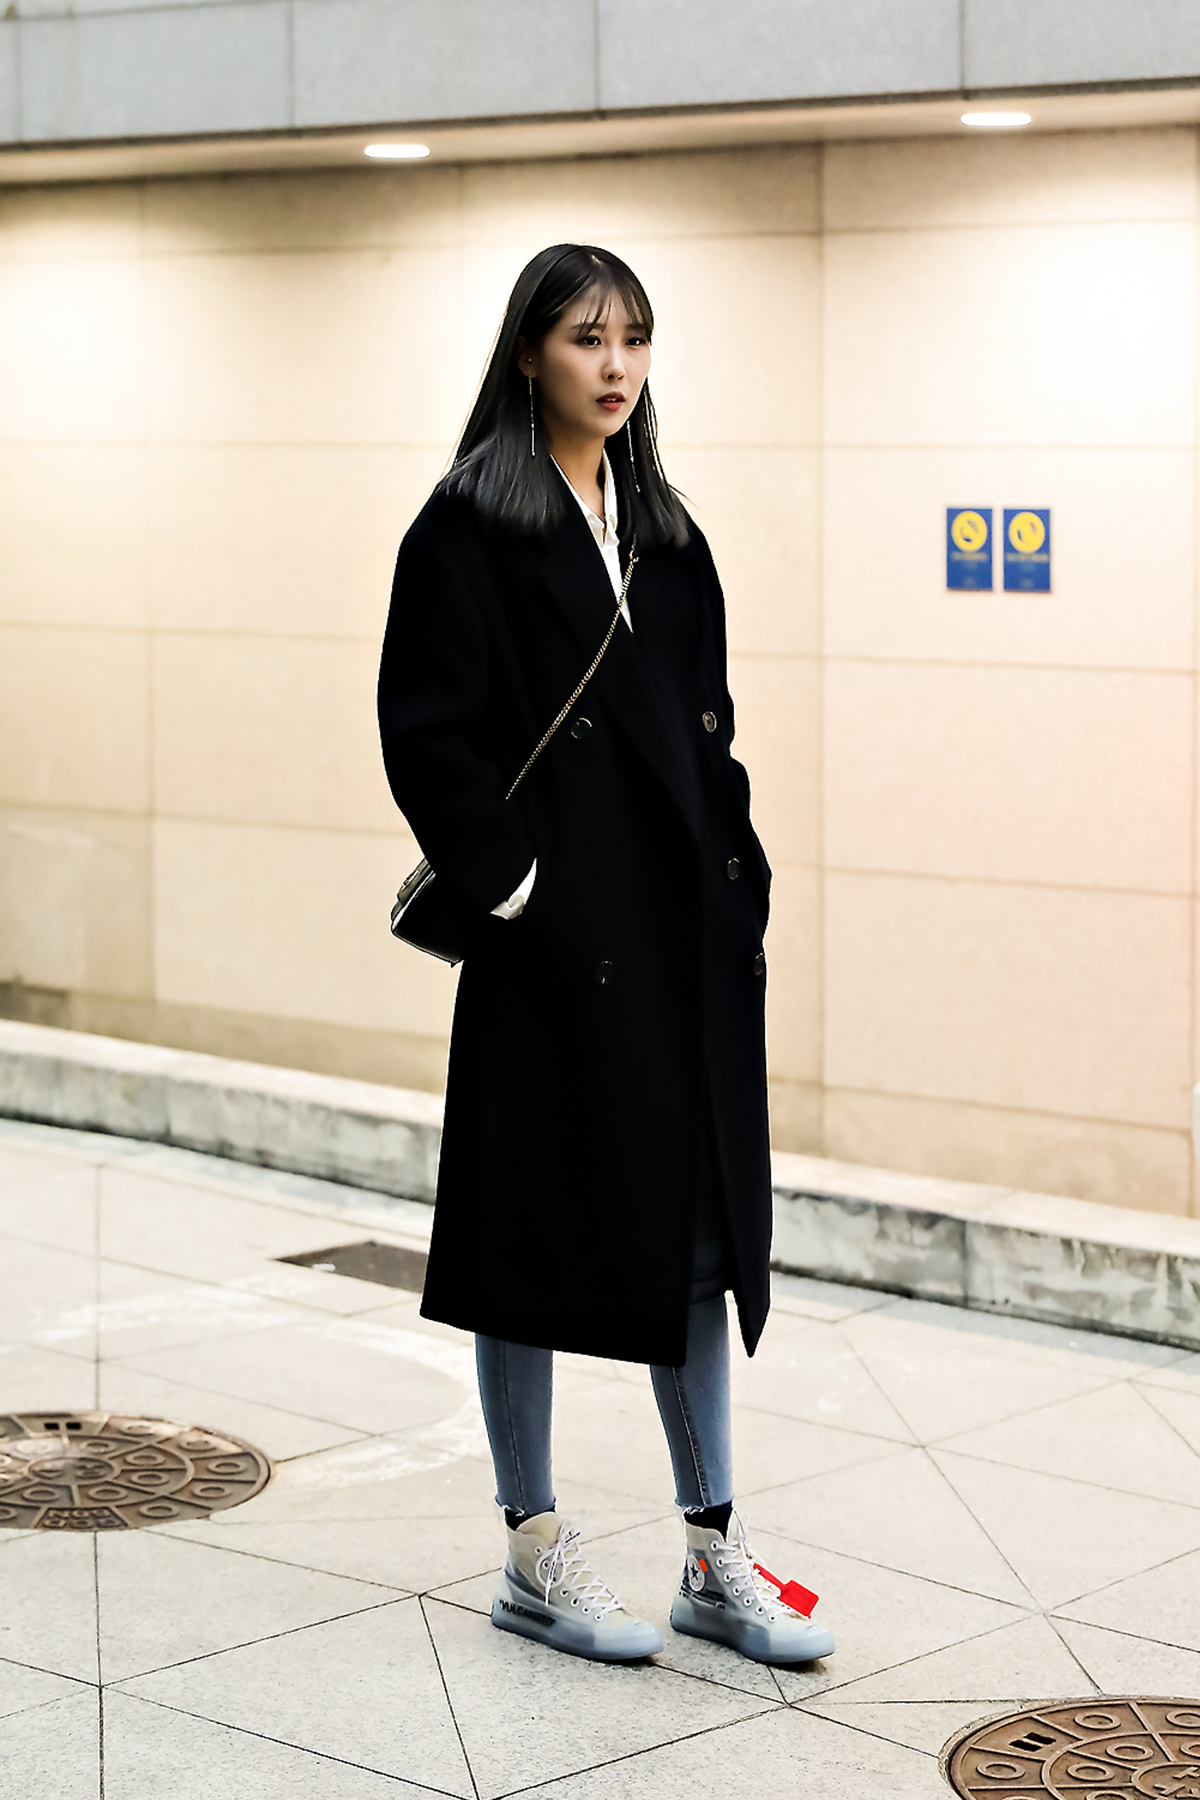 Women fall street style last week of october 2018 inseoul 5